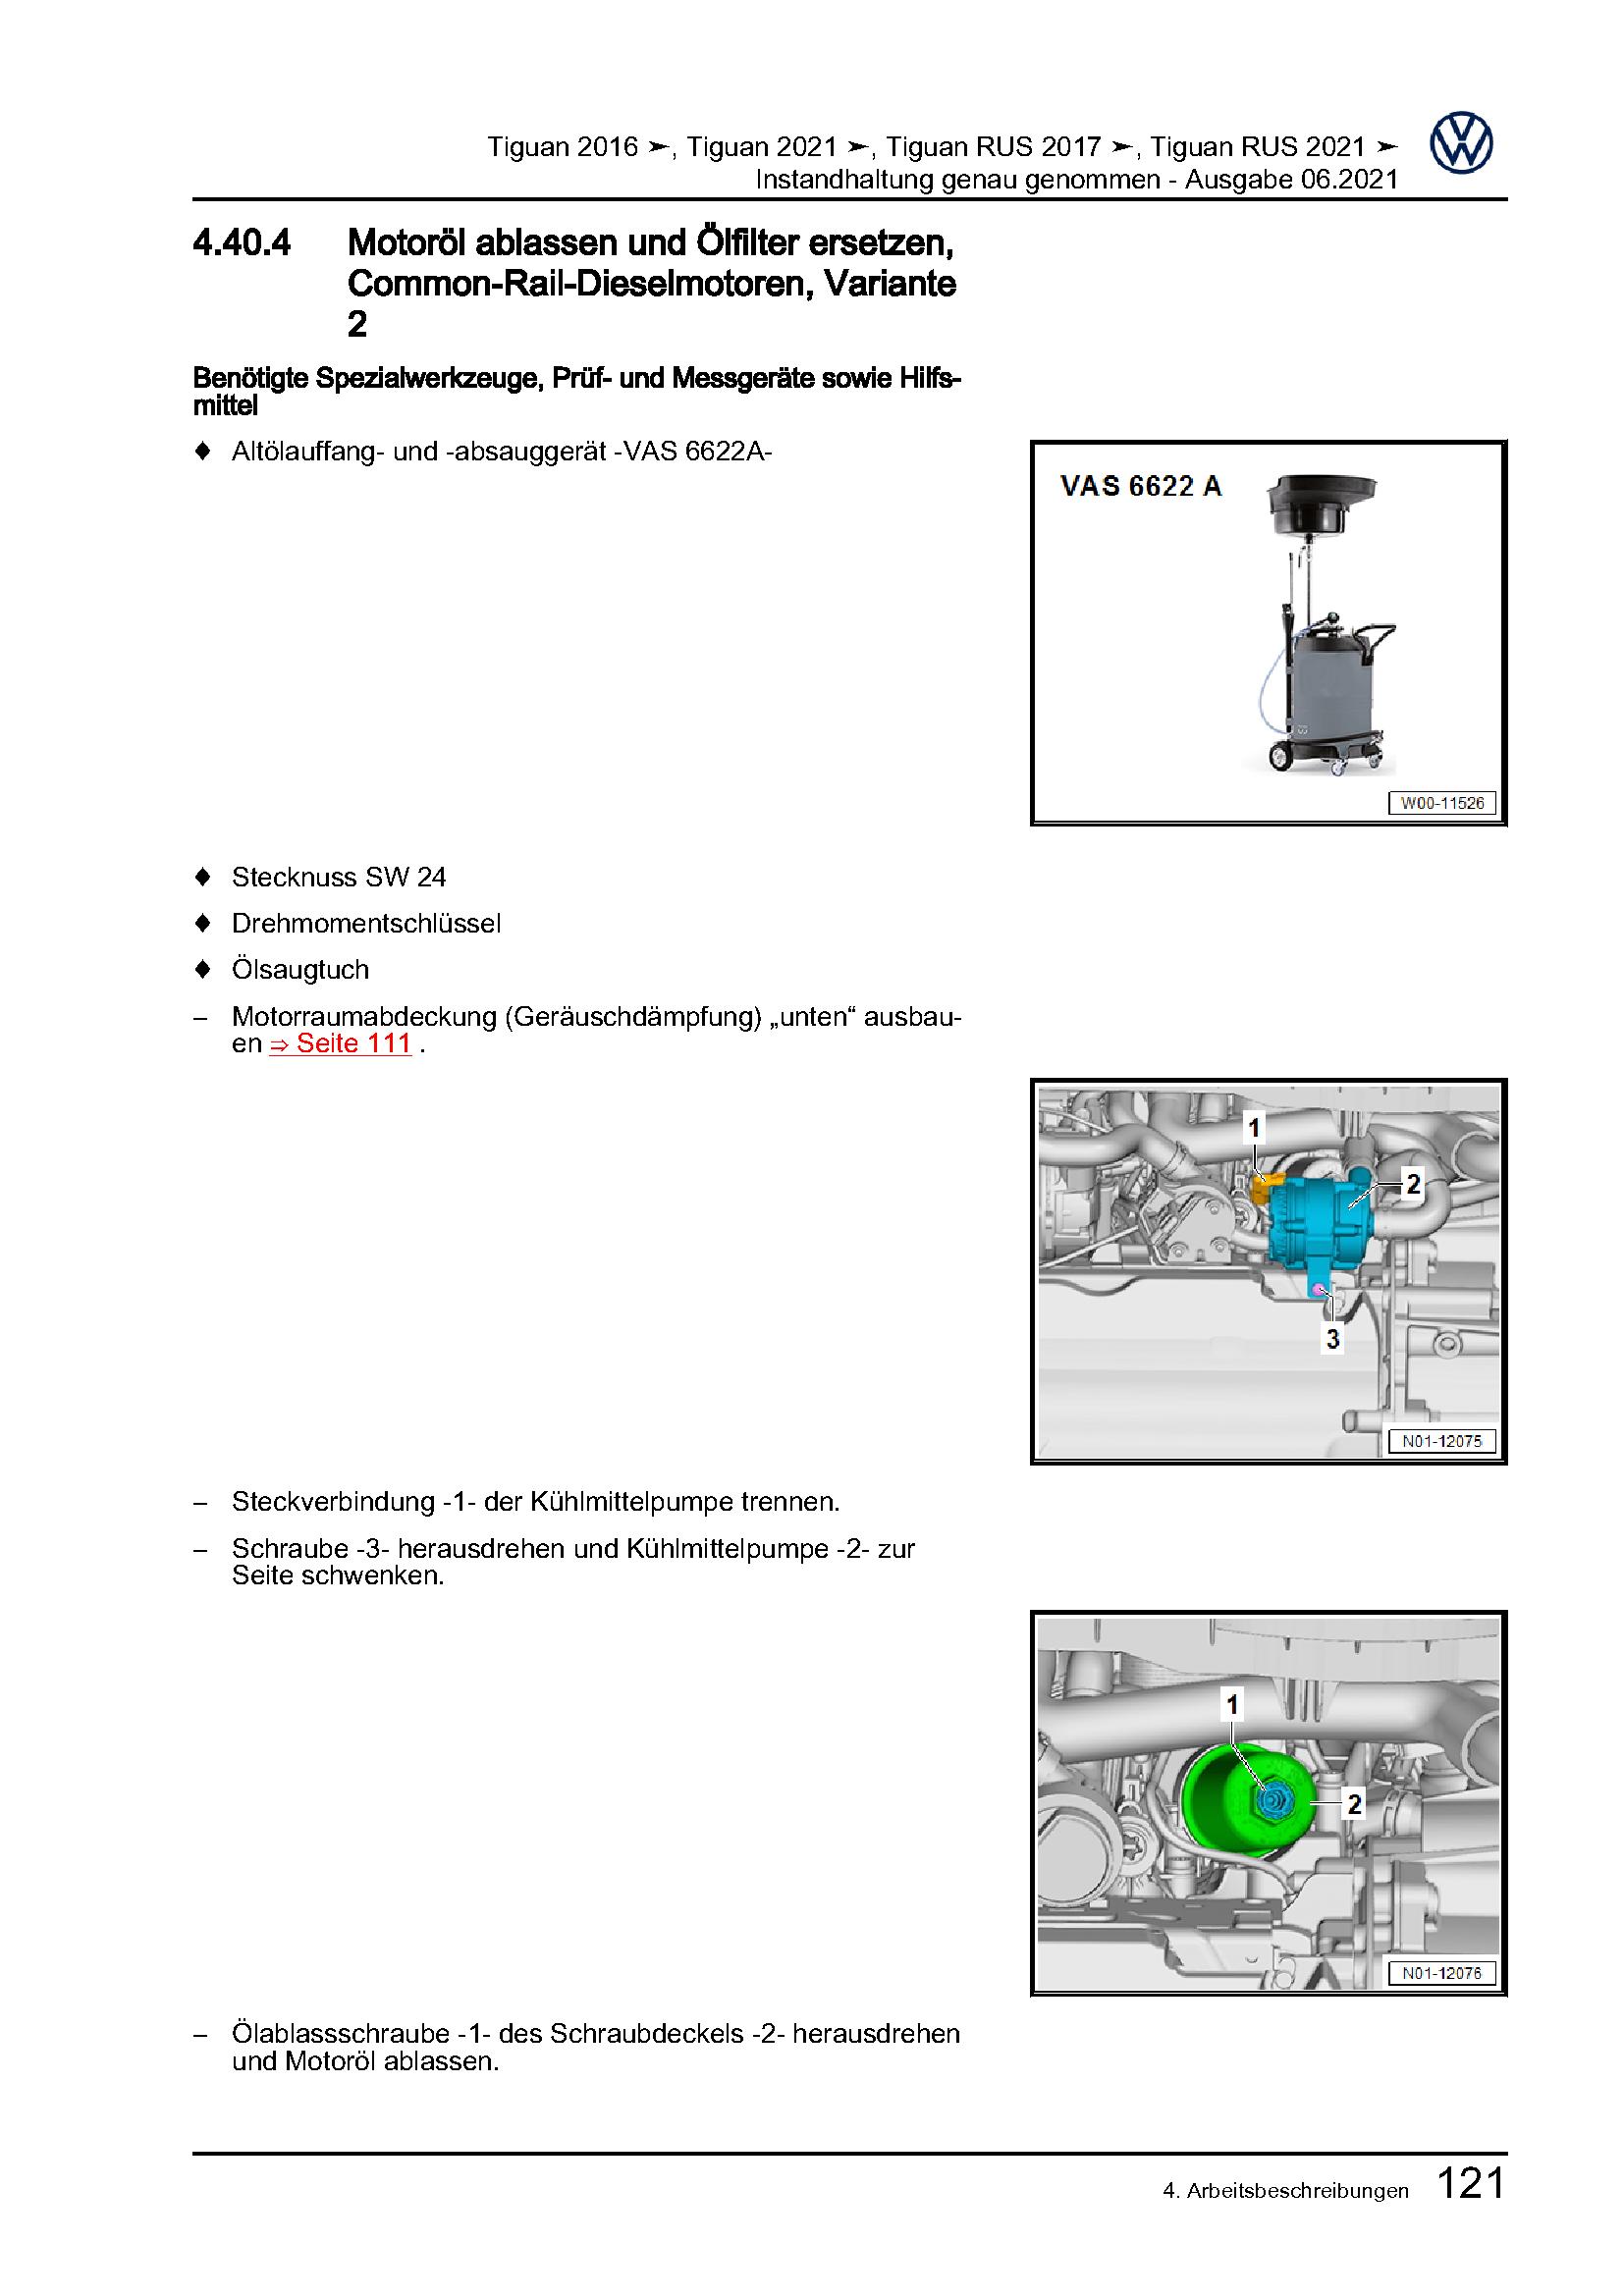 vw-tiguan-ad1-01-instandhaltung_genau_genommen_1.png